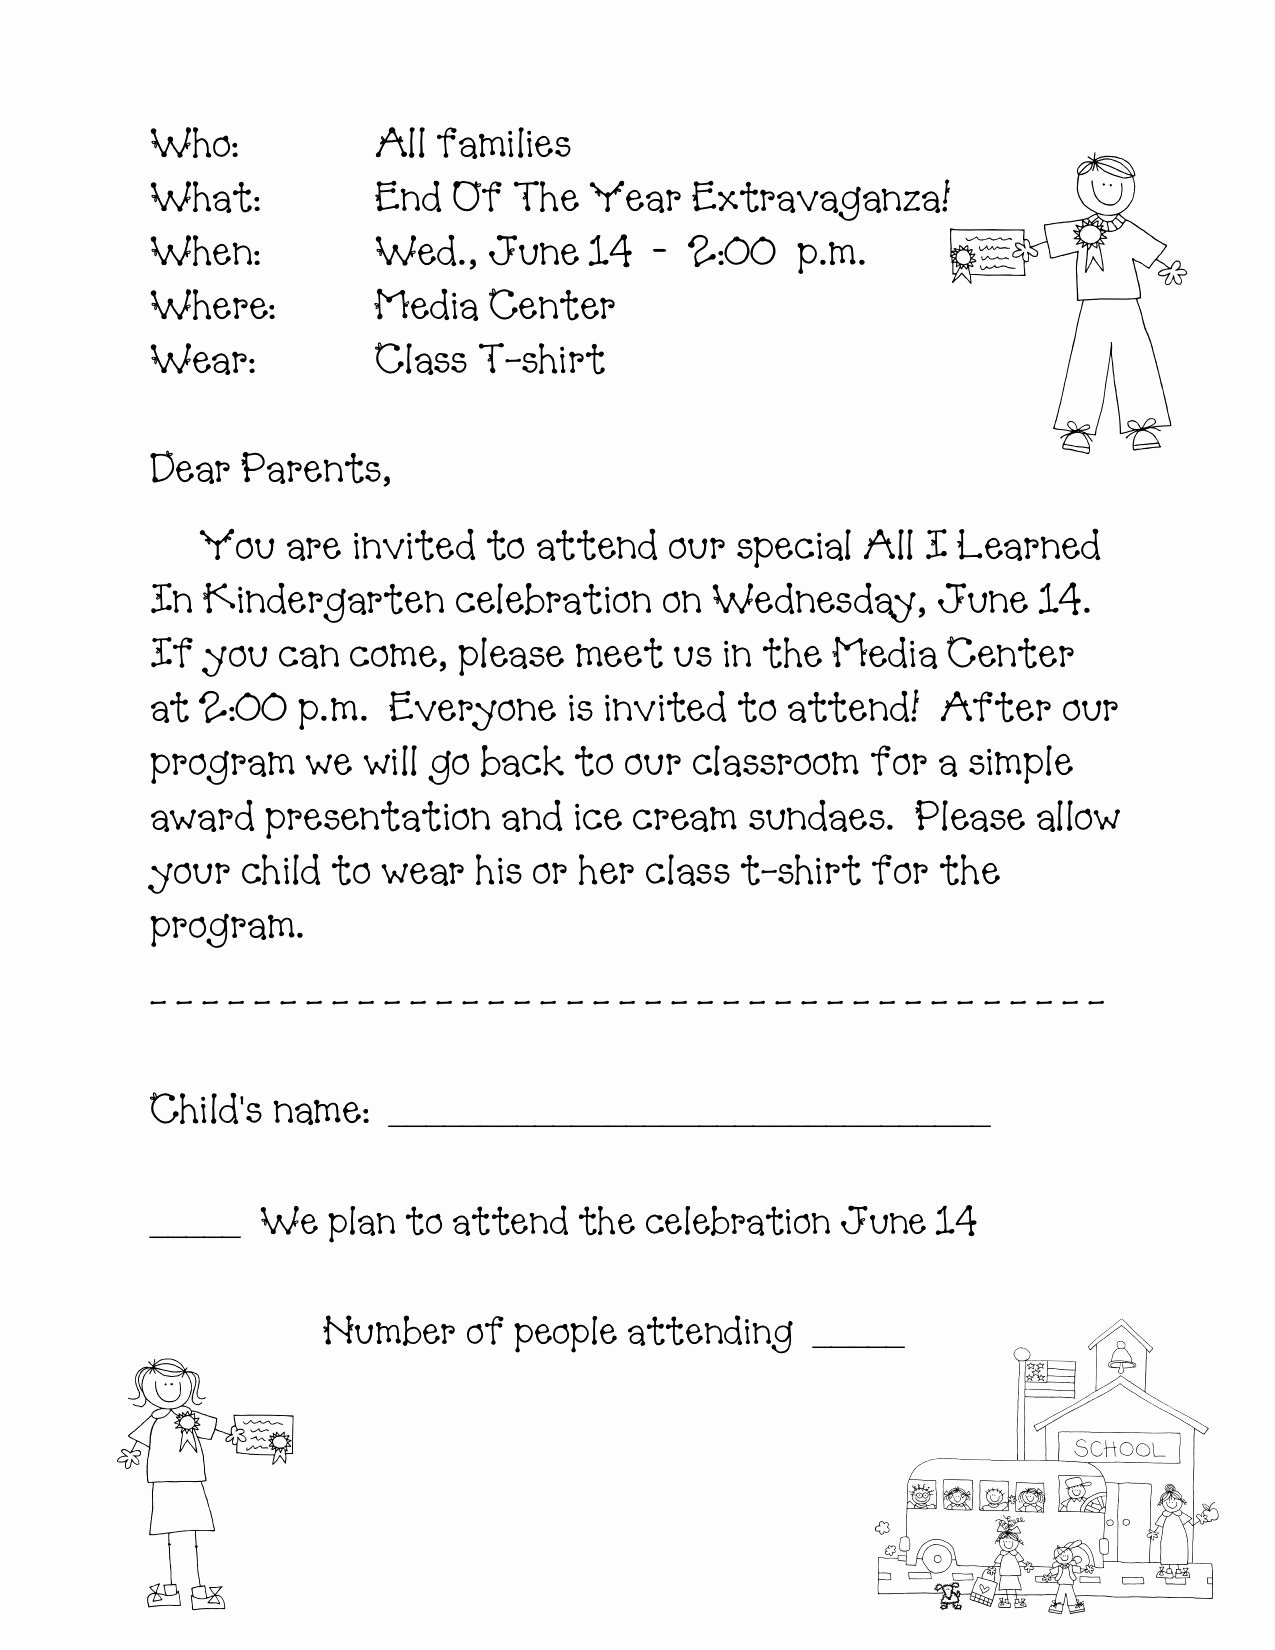 Preschool Graduation Programs Template Unique Preschool Wel E Letter to Parents From Teacher Template